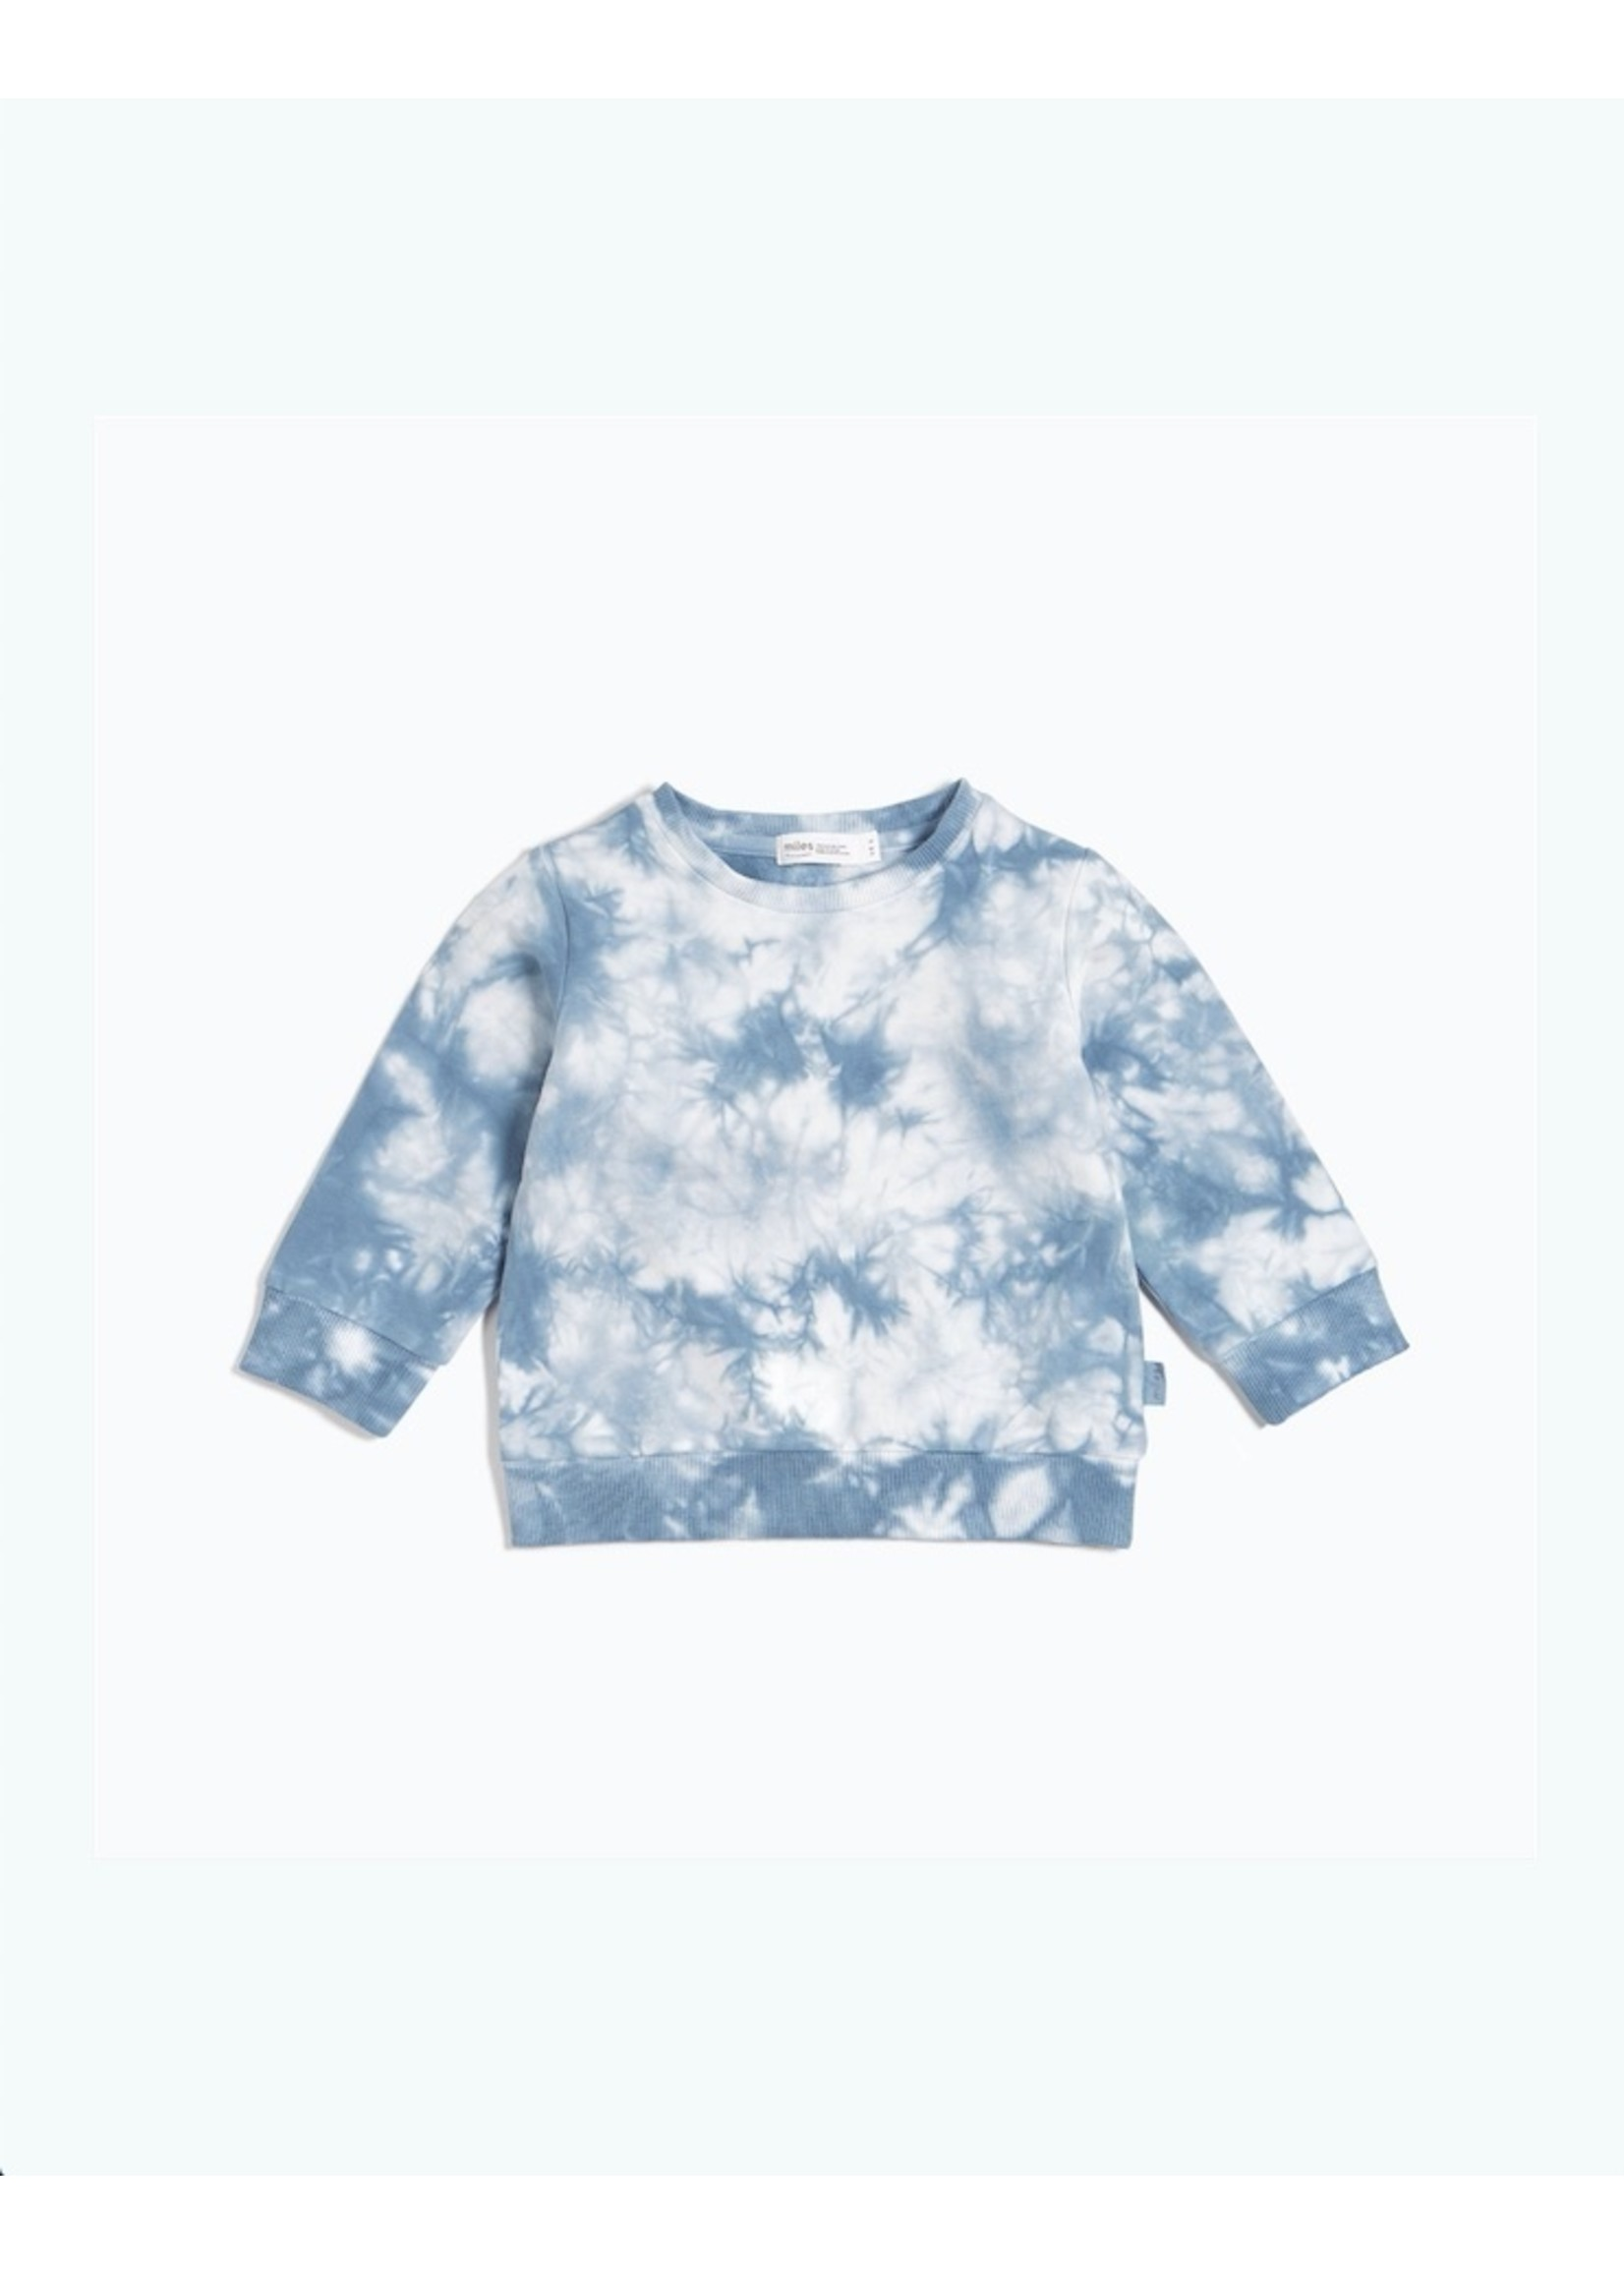 Miles Baby Miles Baby, Candy Sky Tie-Dye Sweatshirt